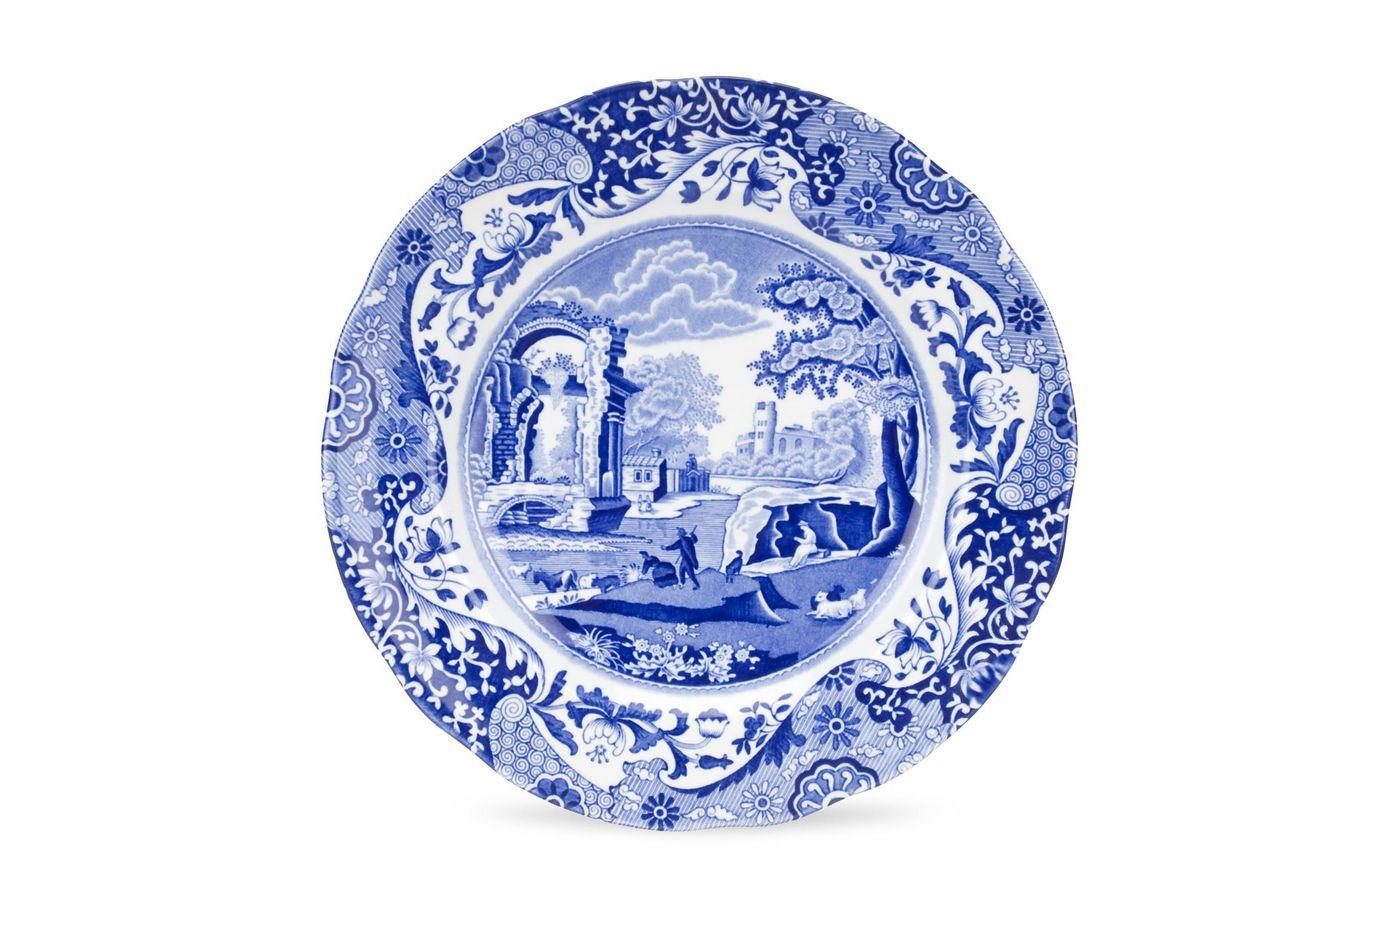 "Spode Blue Italian Breakfast / Salad / Luncheon Plate 9 1/8"" thumb 1"